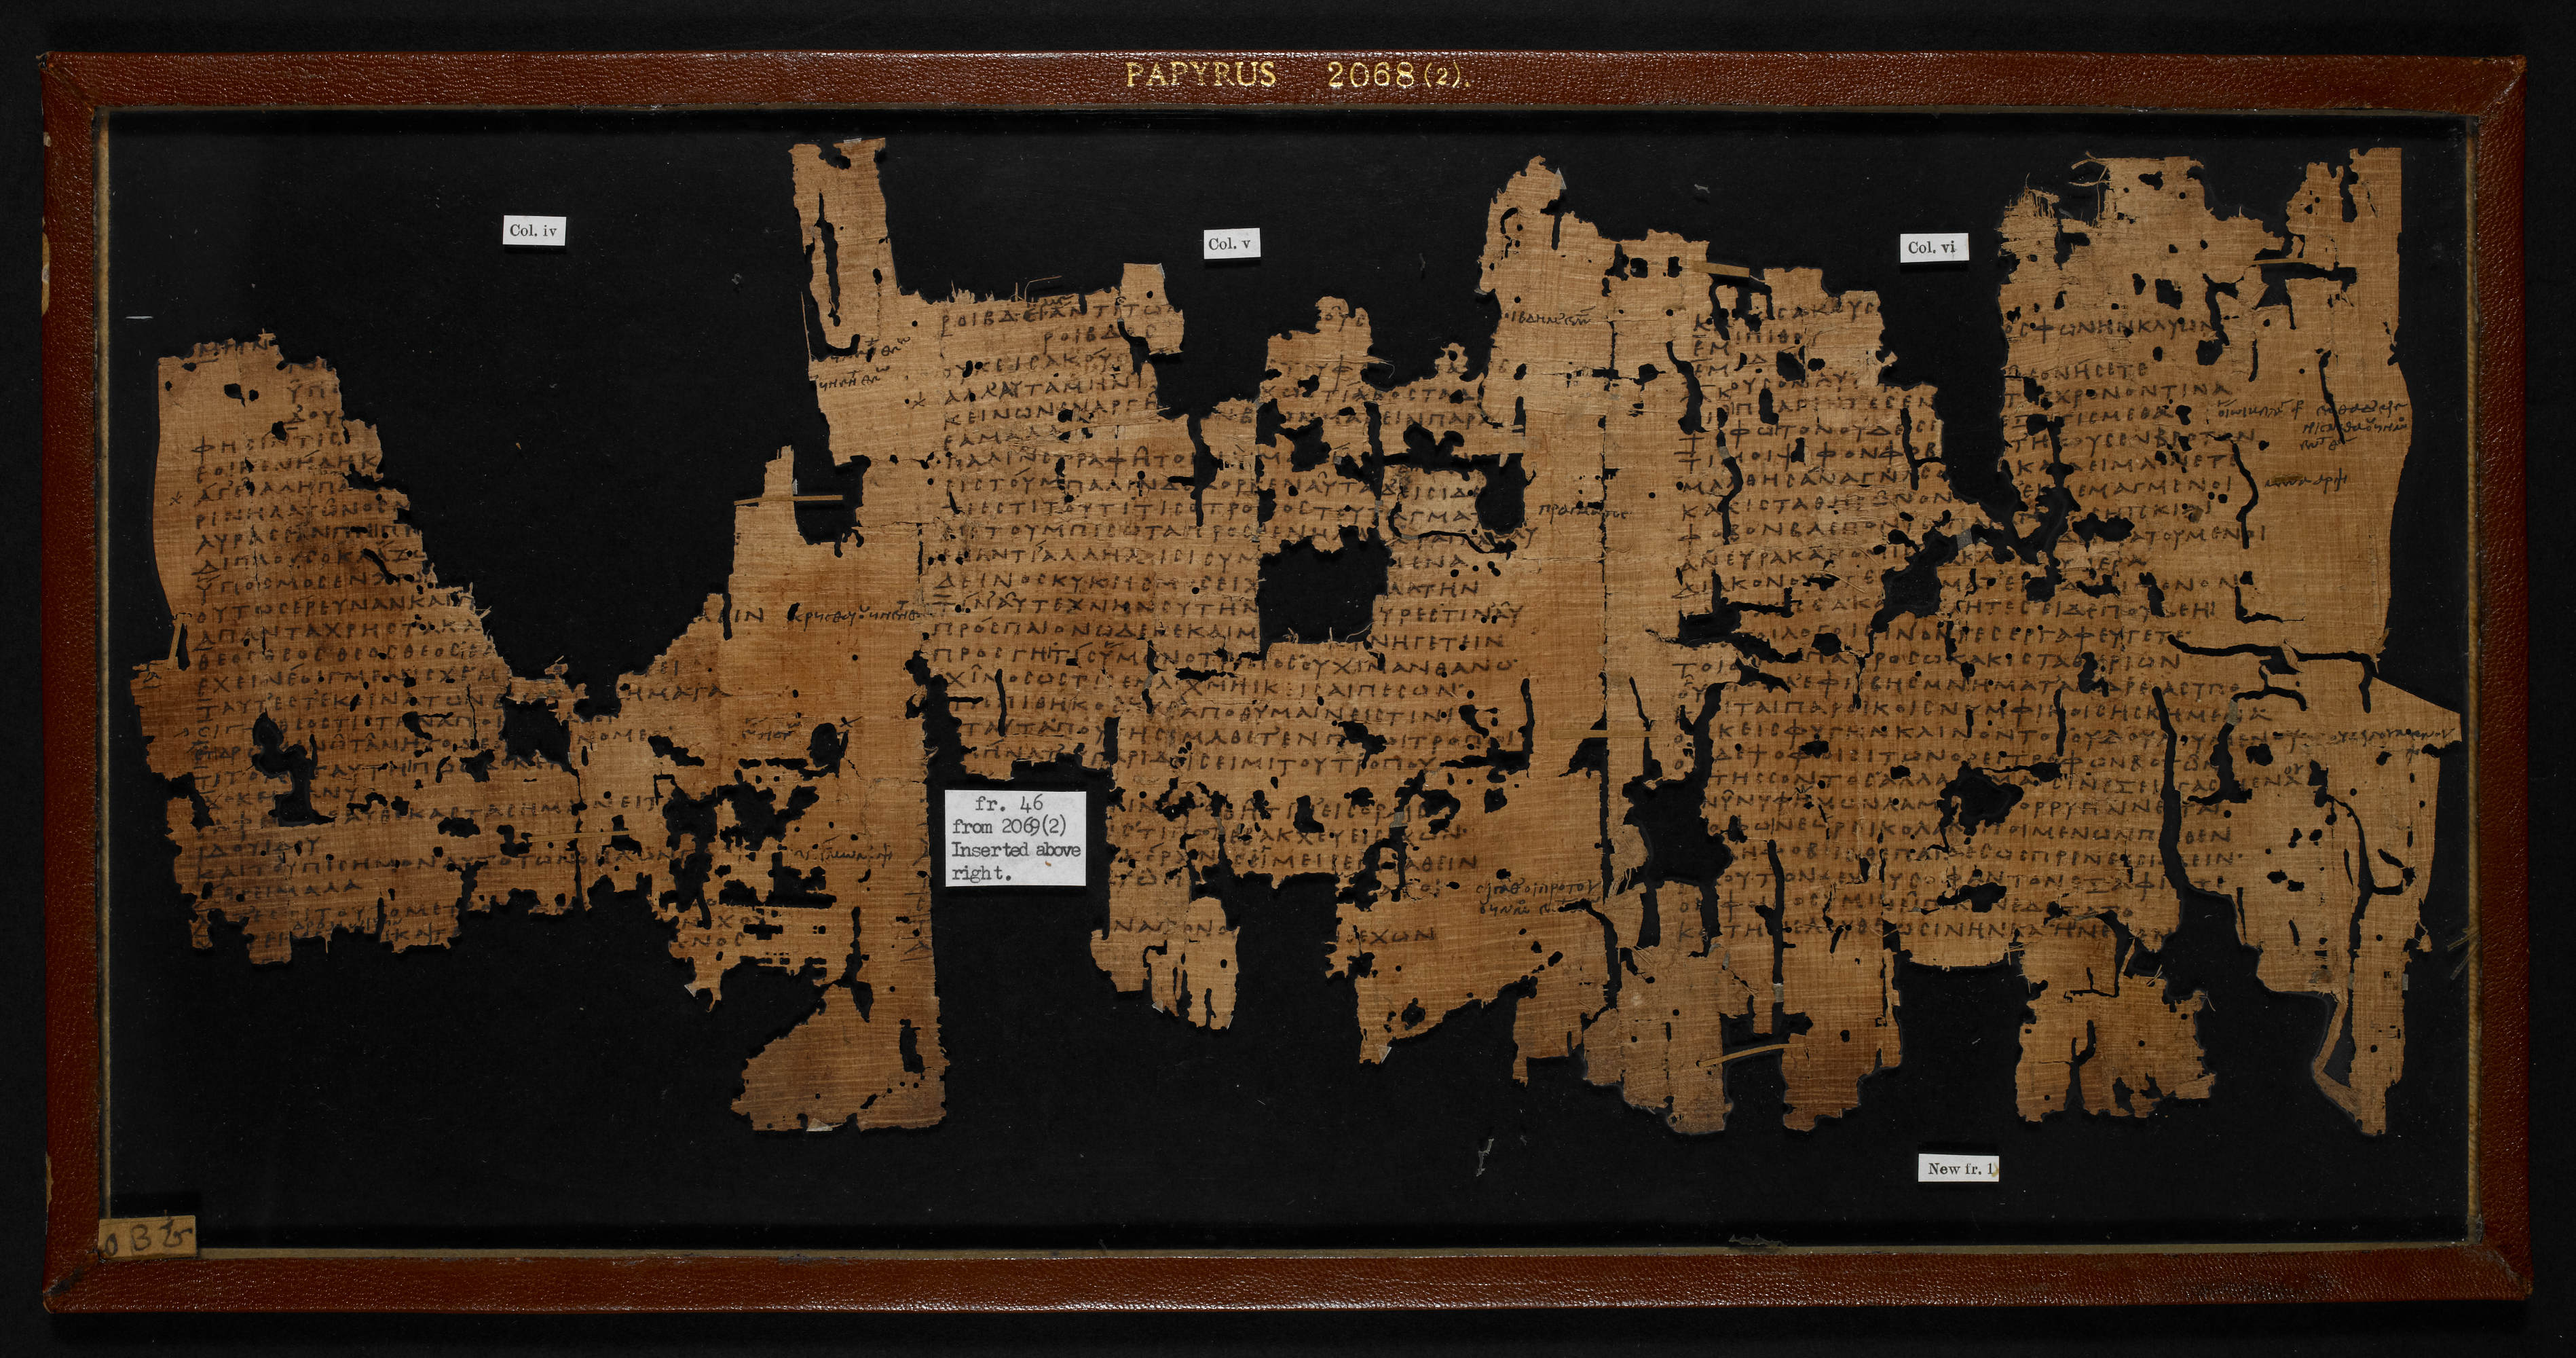 Sophocles' Ichneutae (Papyrus 2068 f002r)